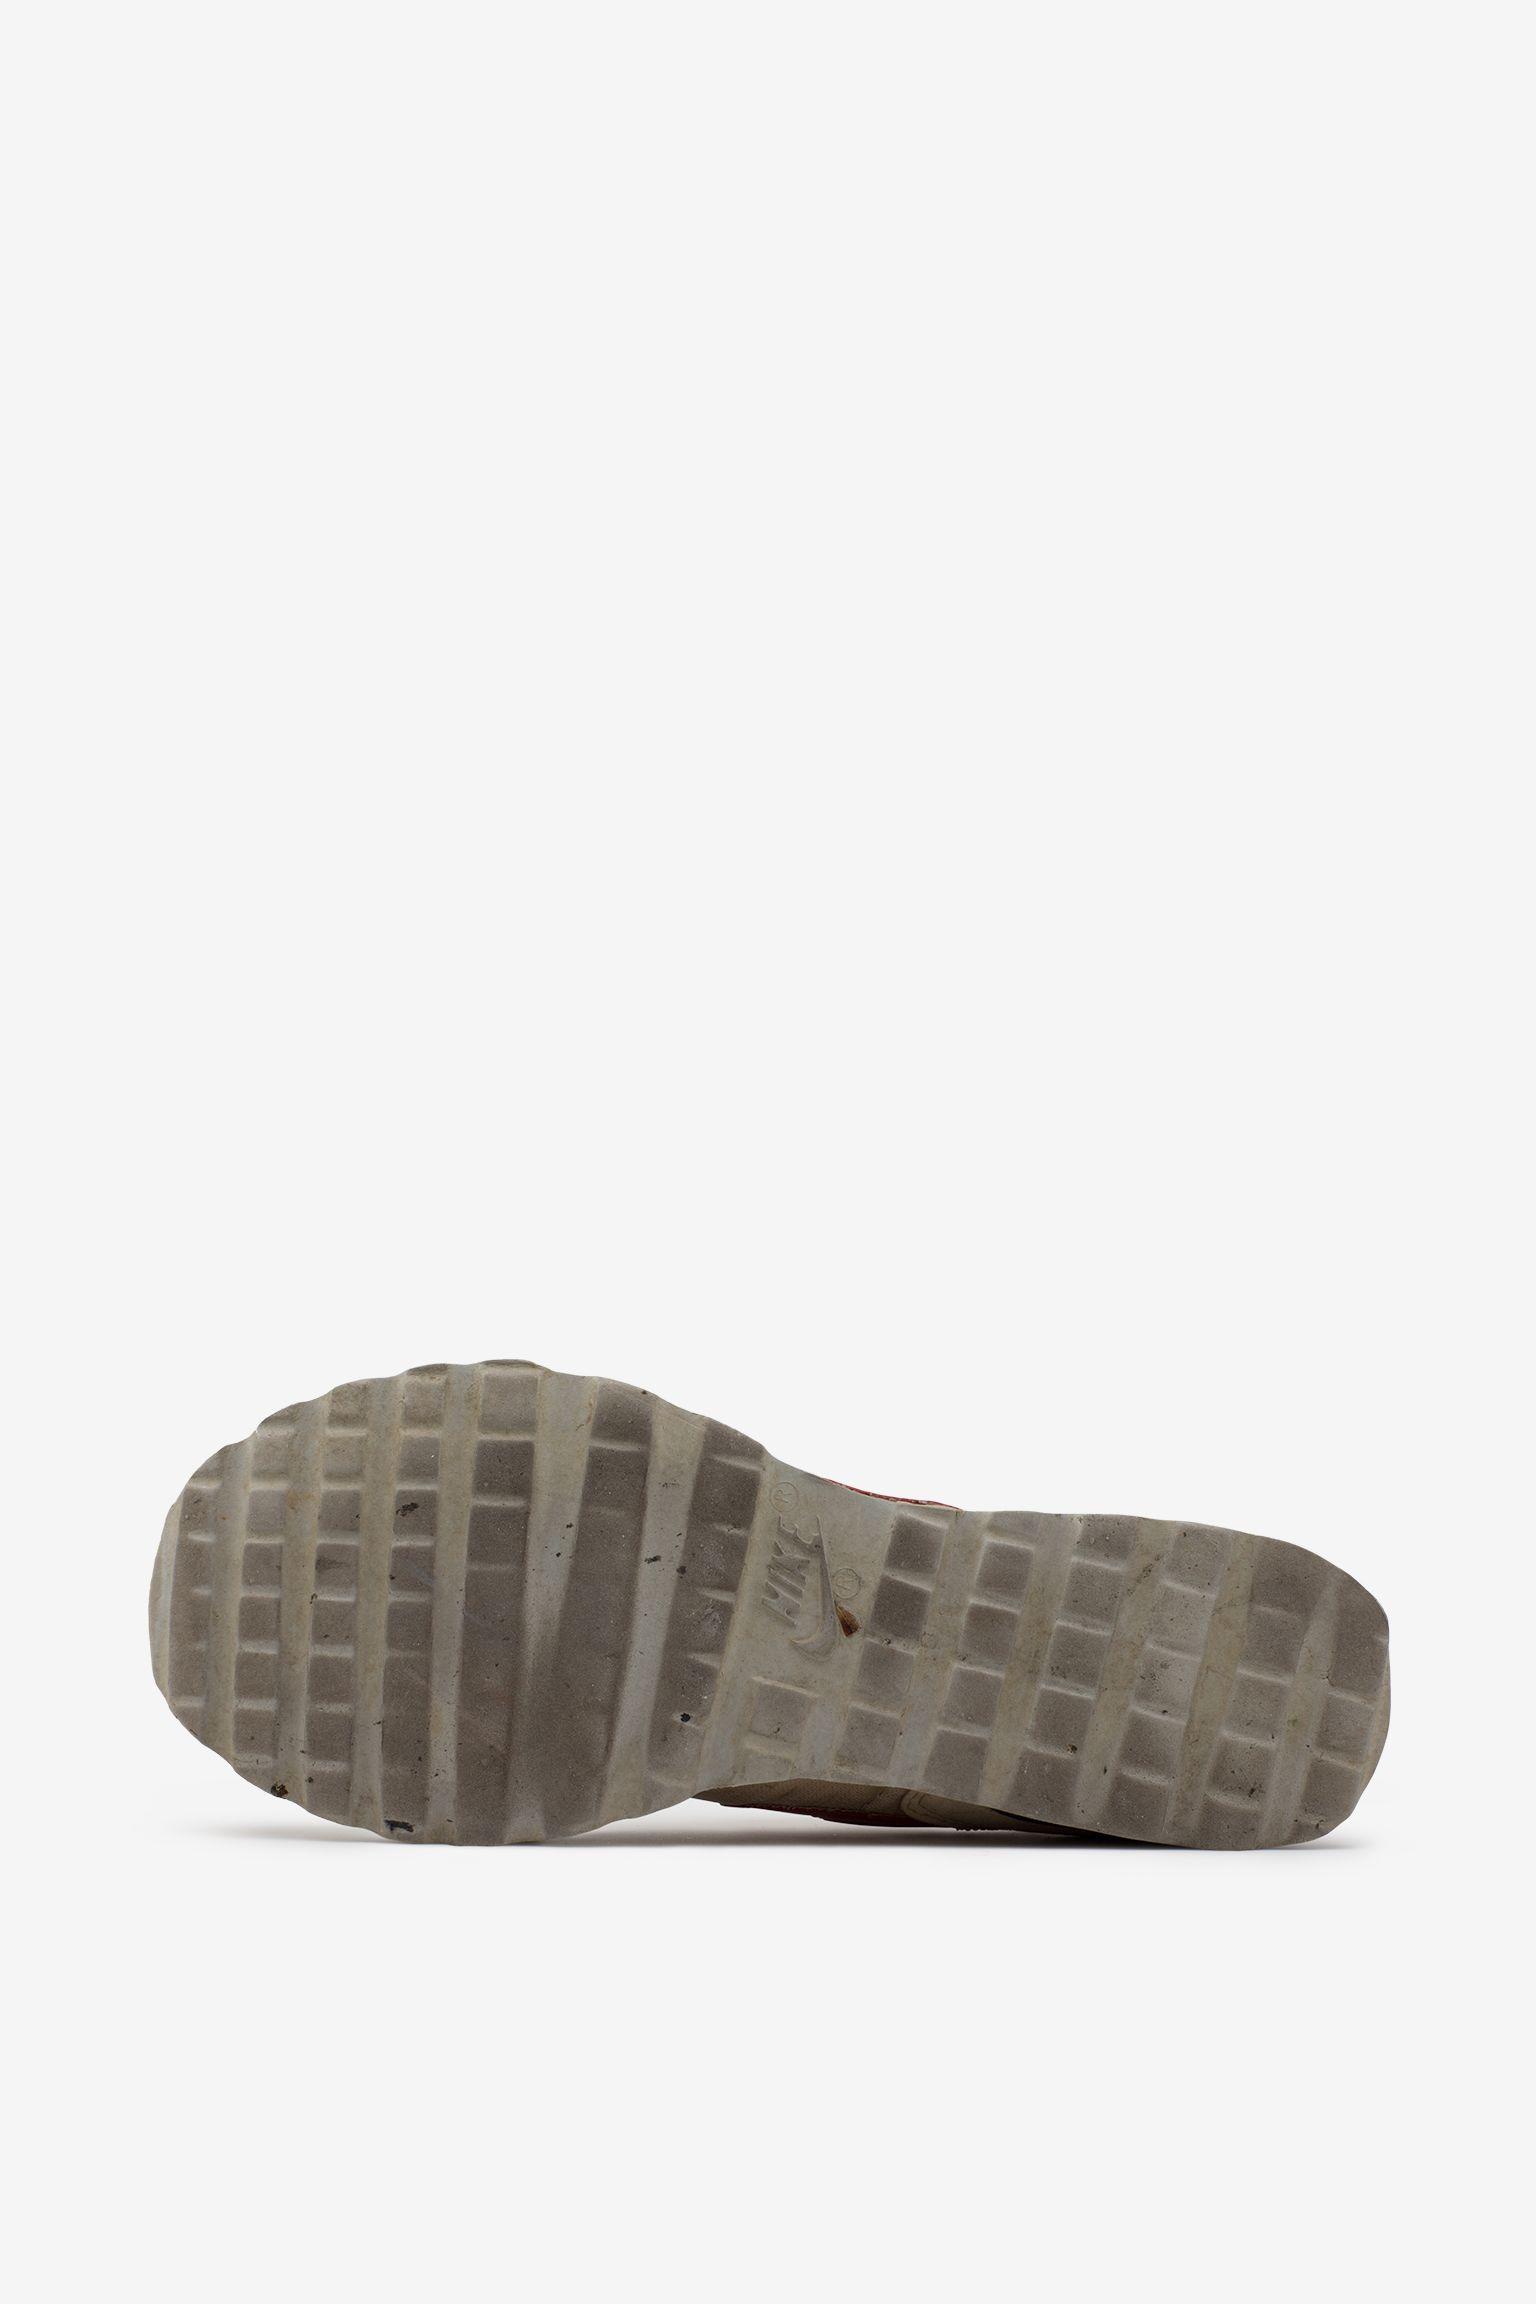 Ten dzień w butach Nike: Daybreak